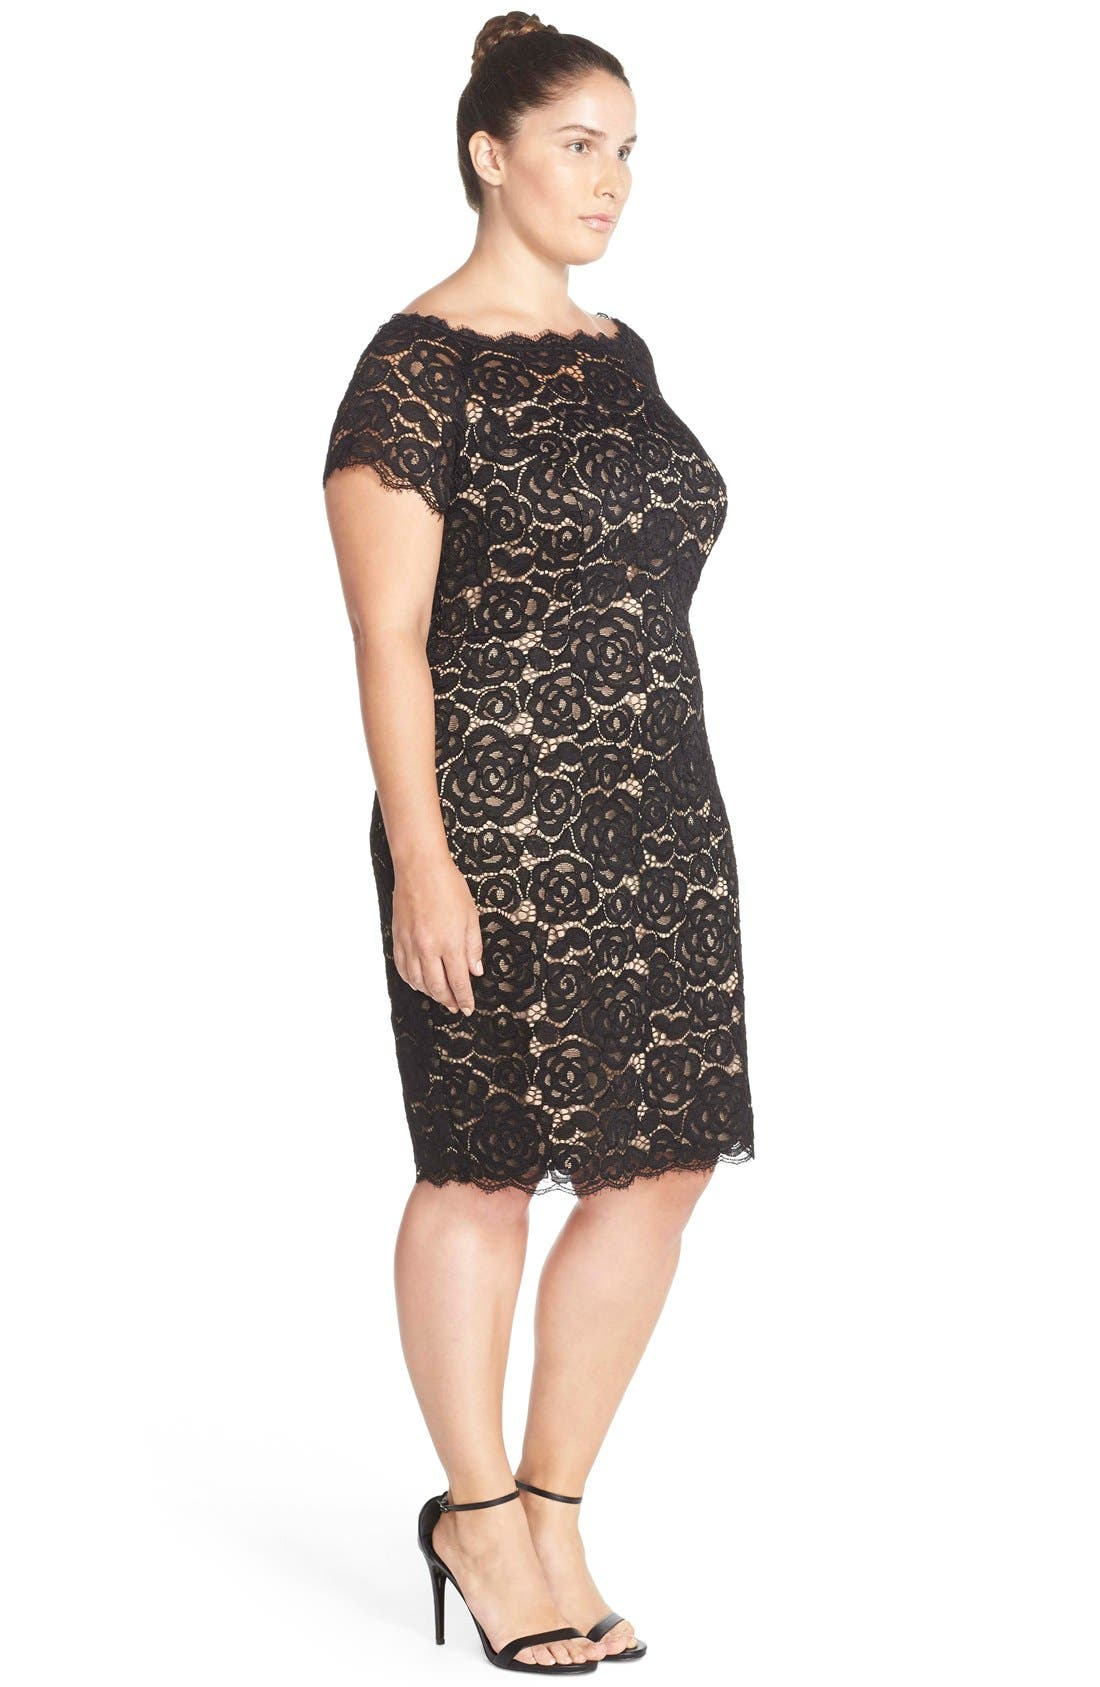 Off the Shoulder Lace Sheath Dress,                             Alternate thumbnail 6, color,                             BLACK/ NUDE